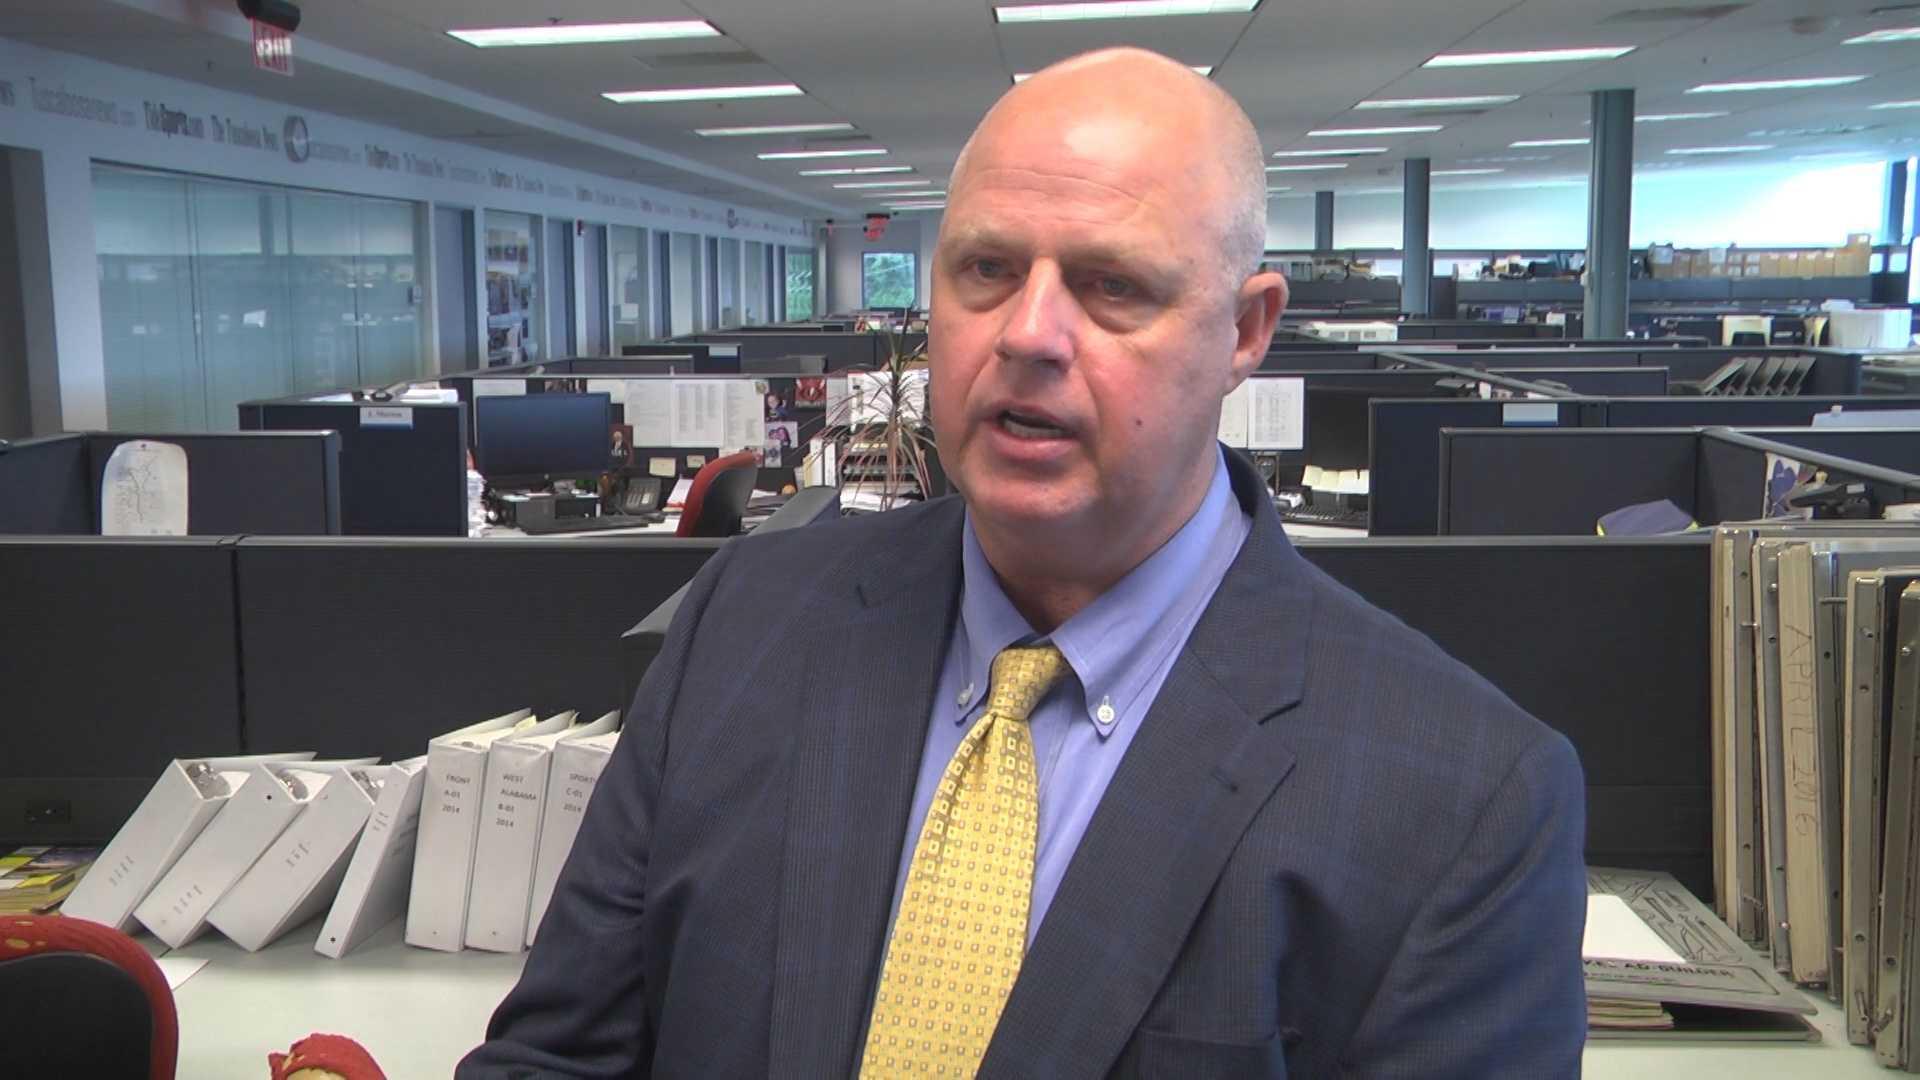 Elwin Crawford, Tuscaloosa EMS director